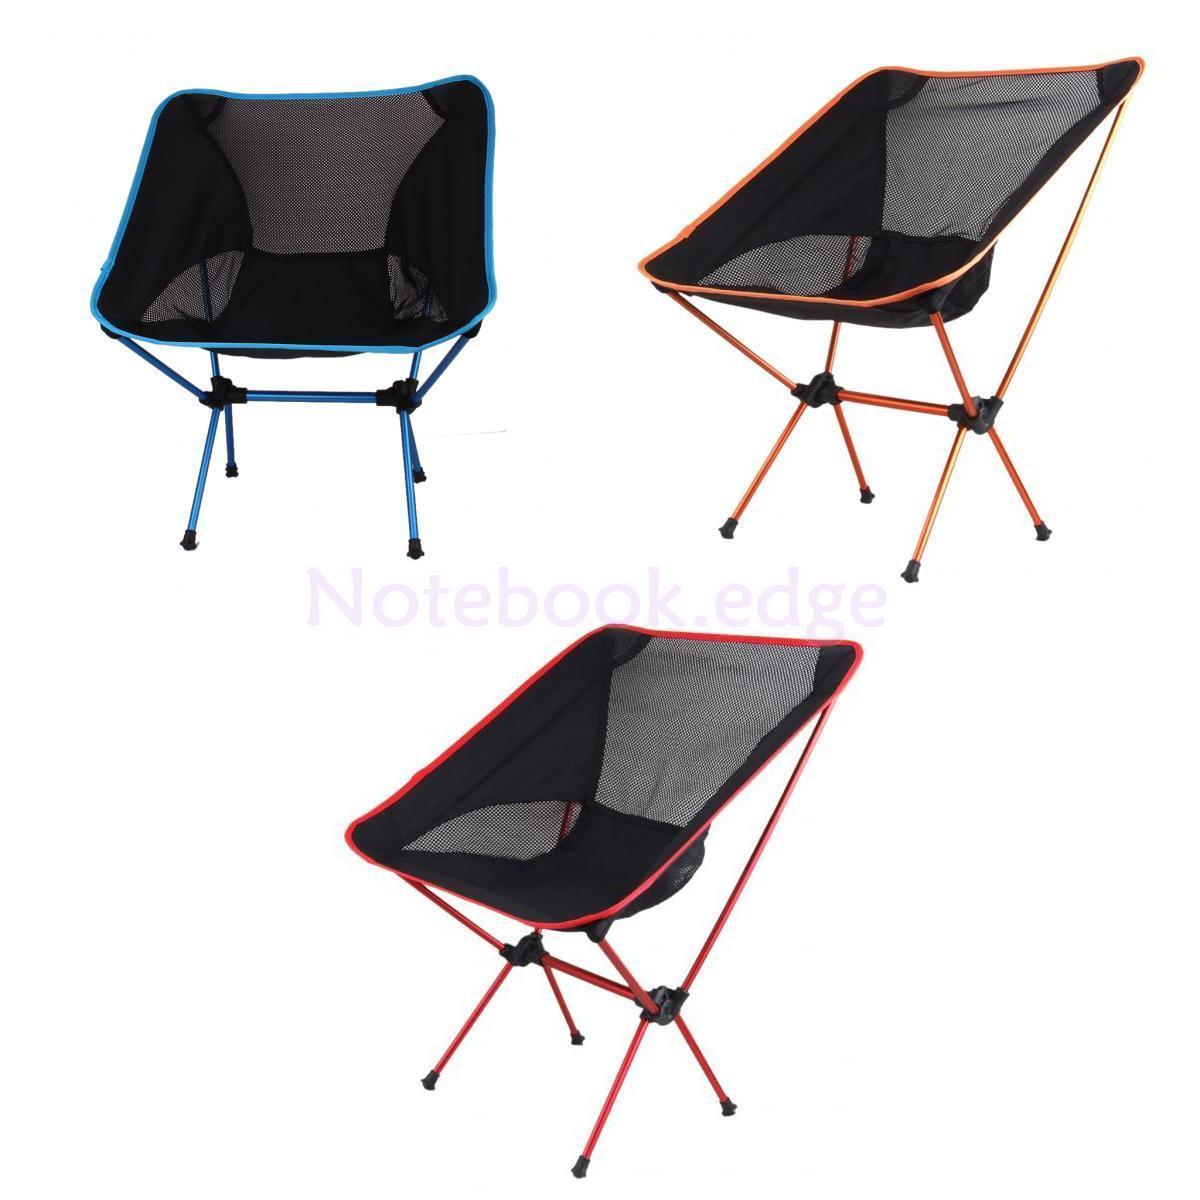 Portable Chair Fold Up Folding Seat Stool Fishing Camping